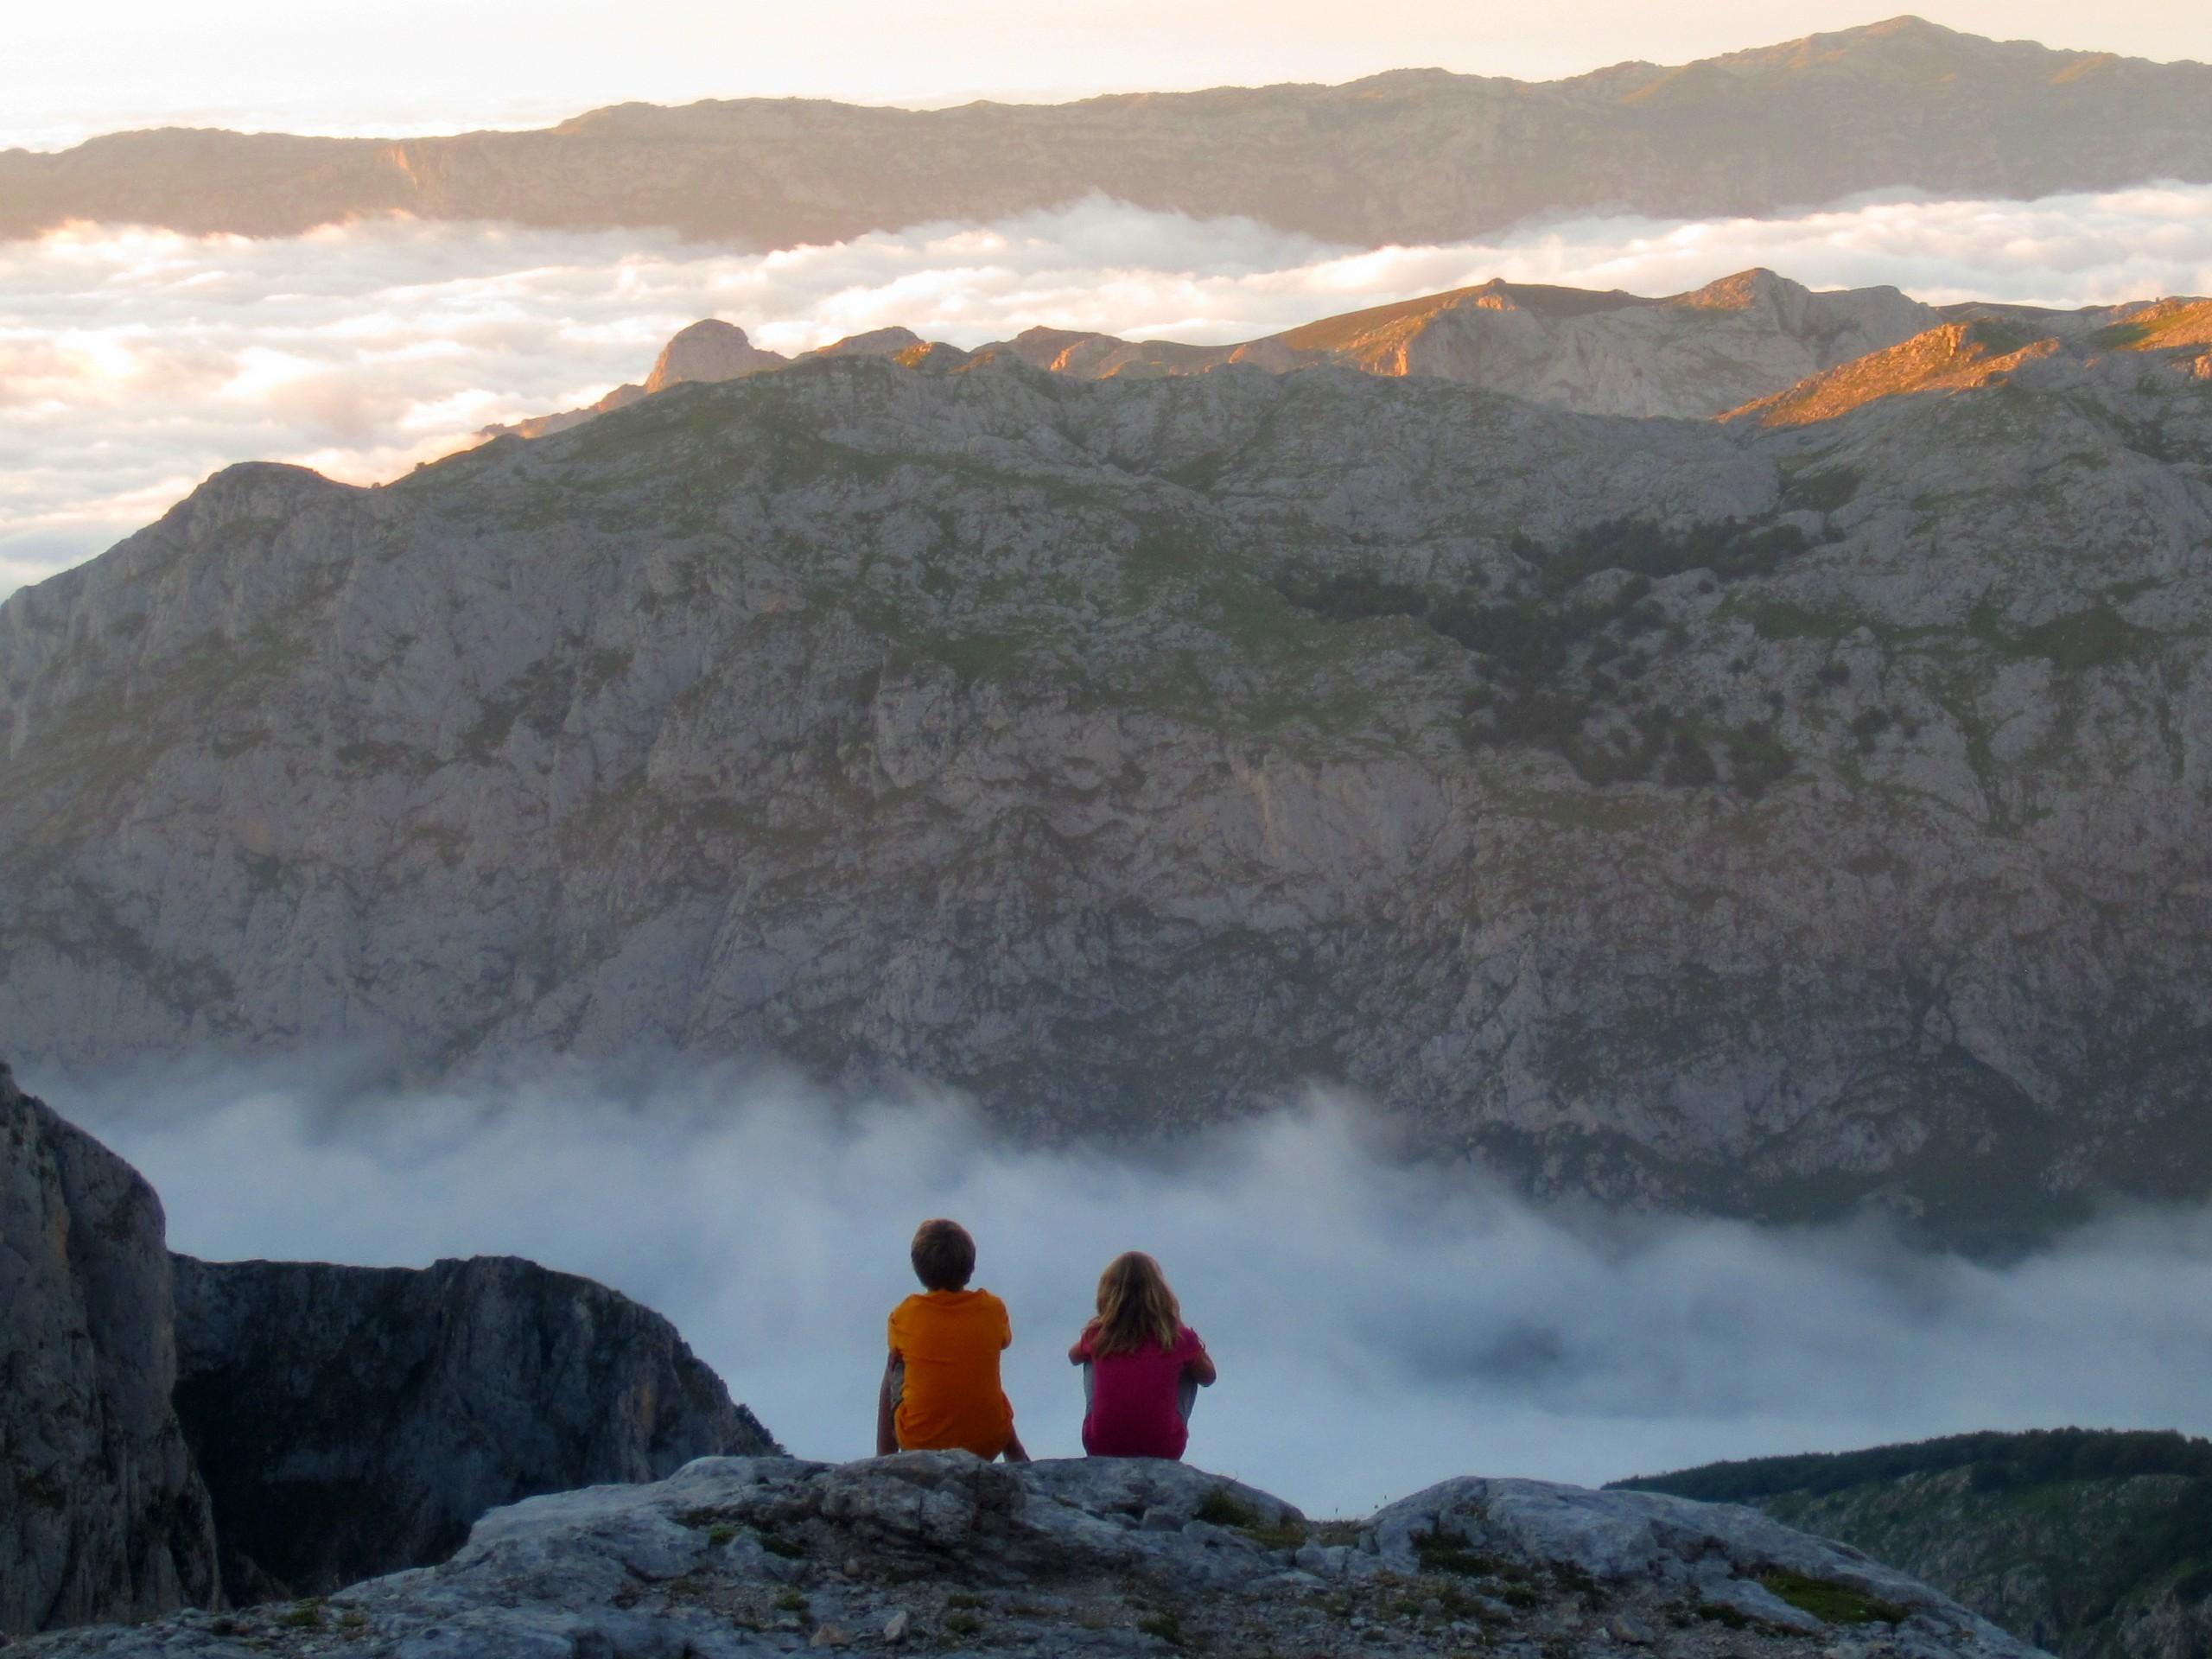 Couple enjoying the sunset views near Picos de Europa